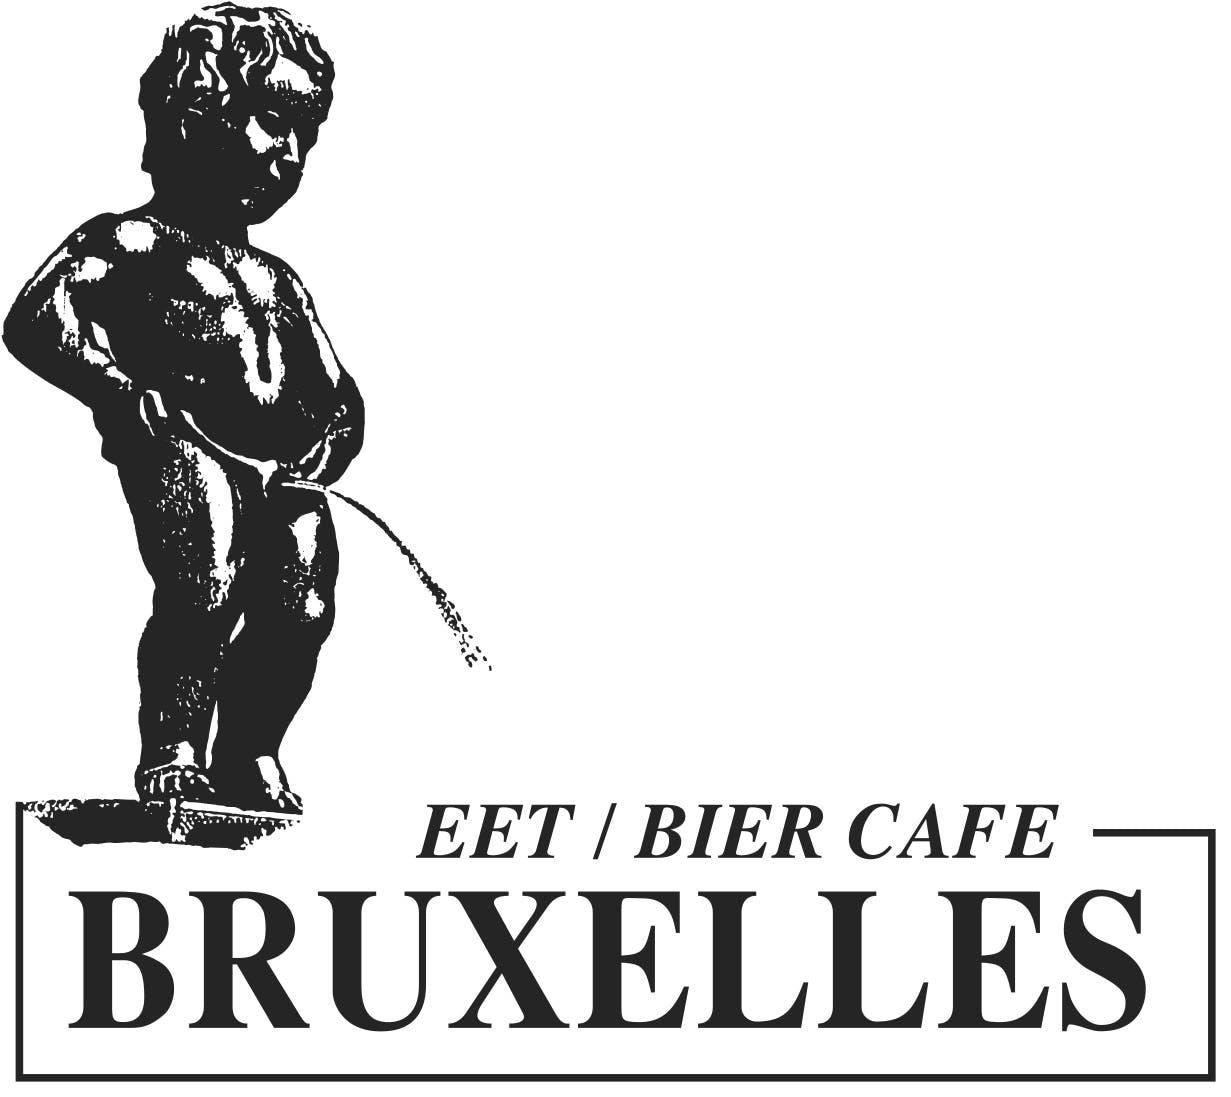 Eet-biercafe Bruxelles Logo